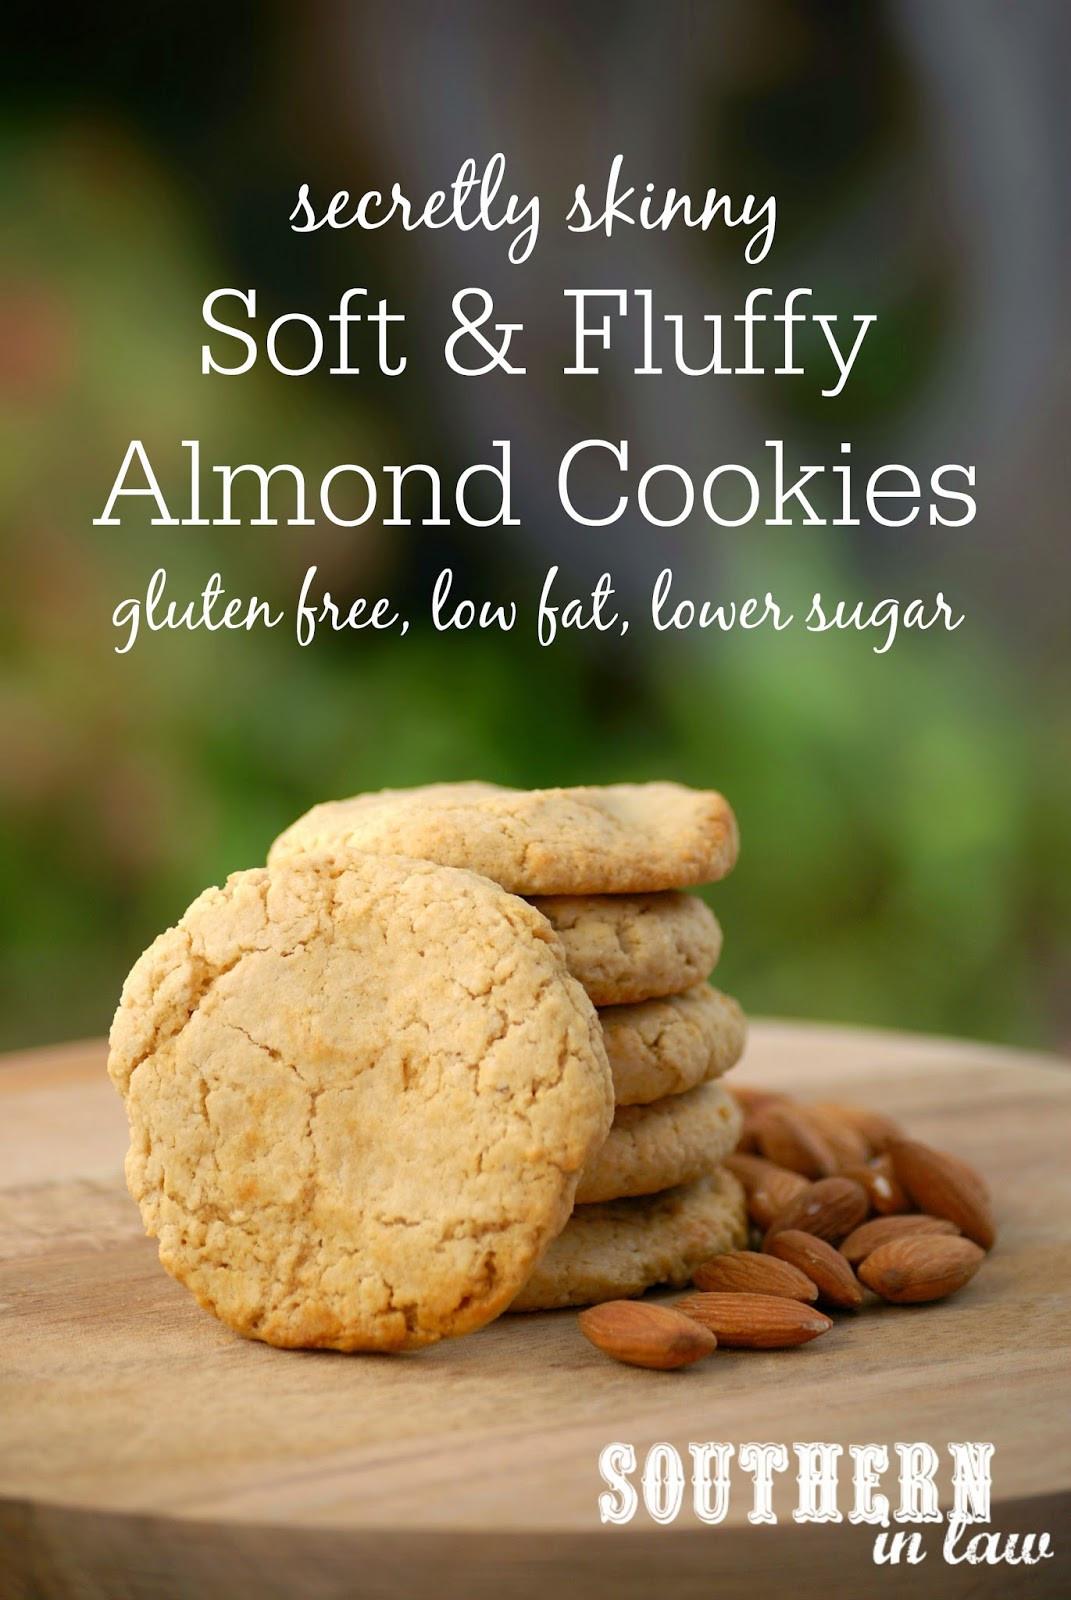 Low Fat Low Sugar Cookies  Southern In Law Recipe Secretly Skinny Almond Meal Cookies